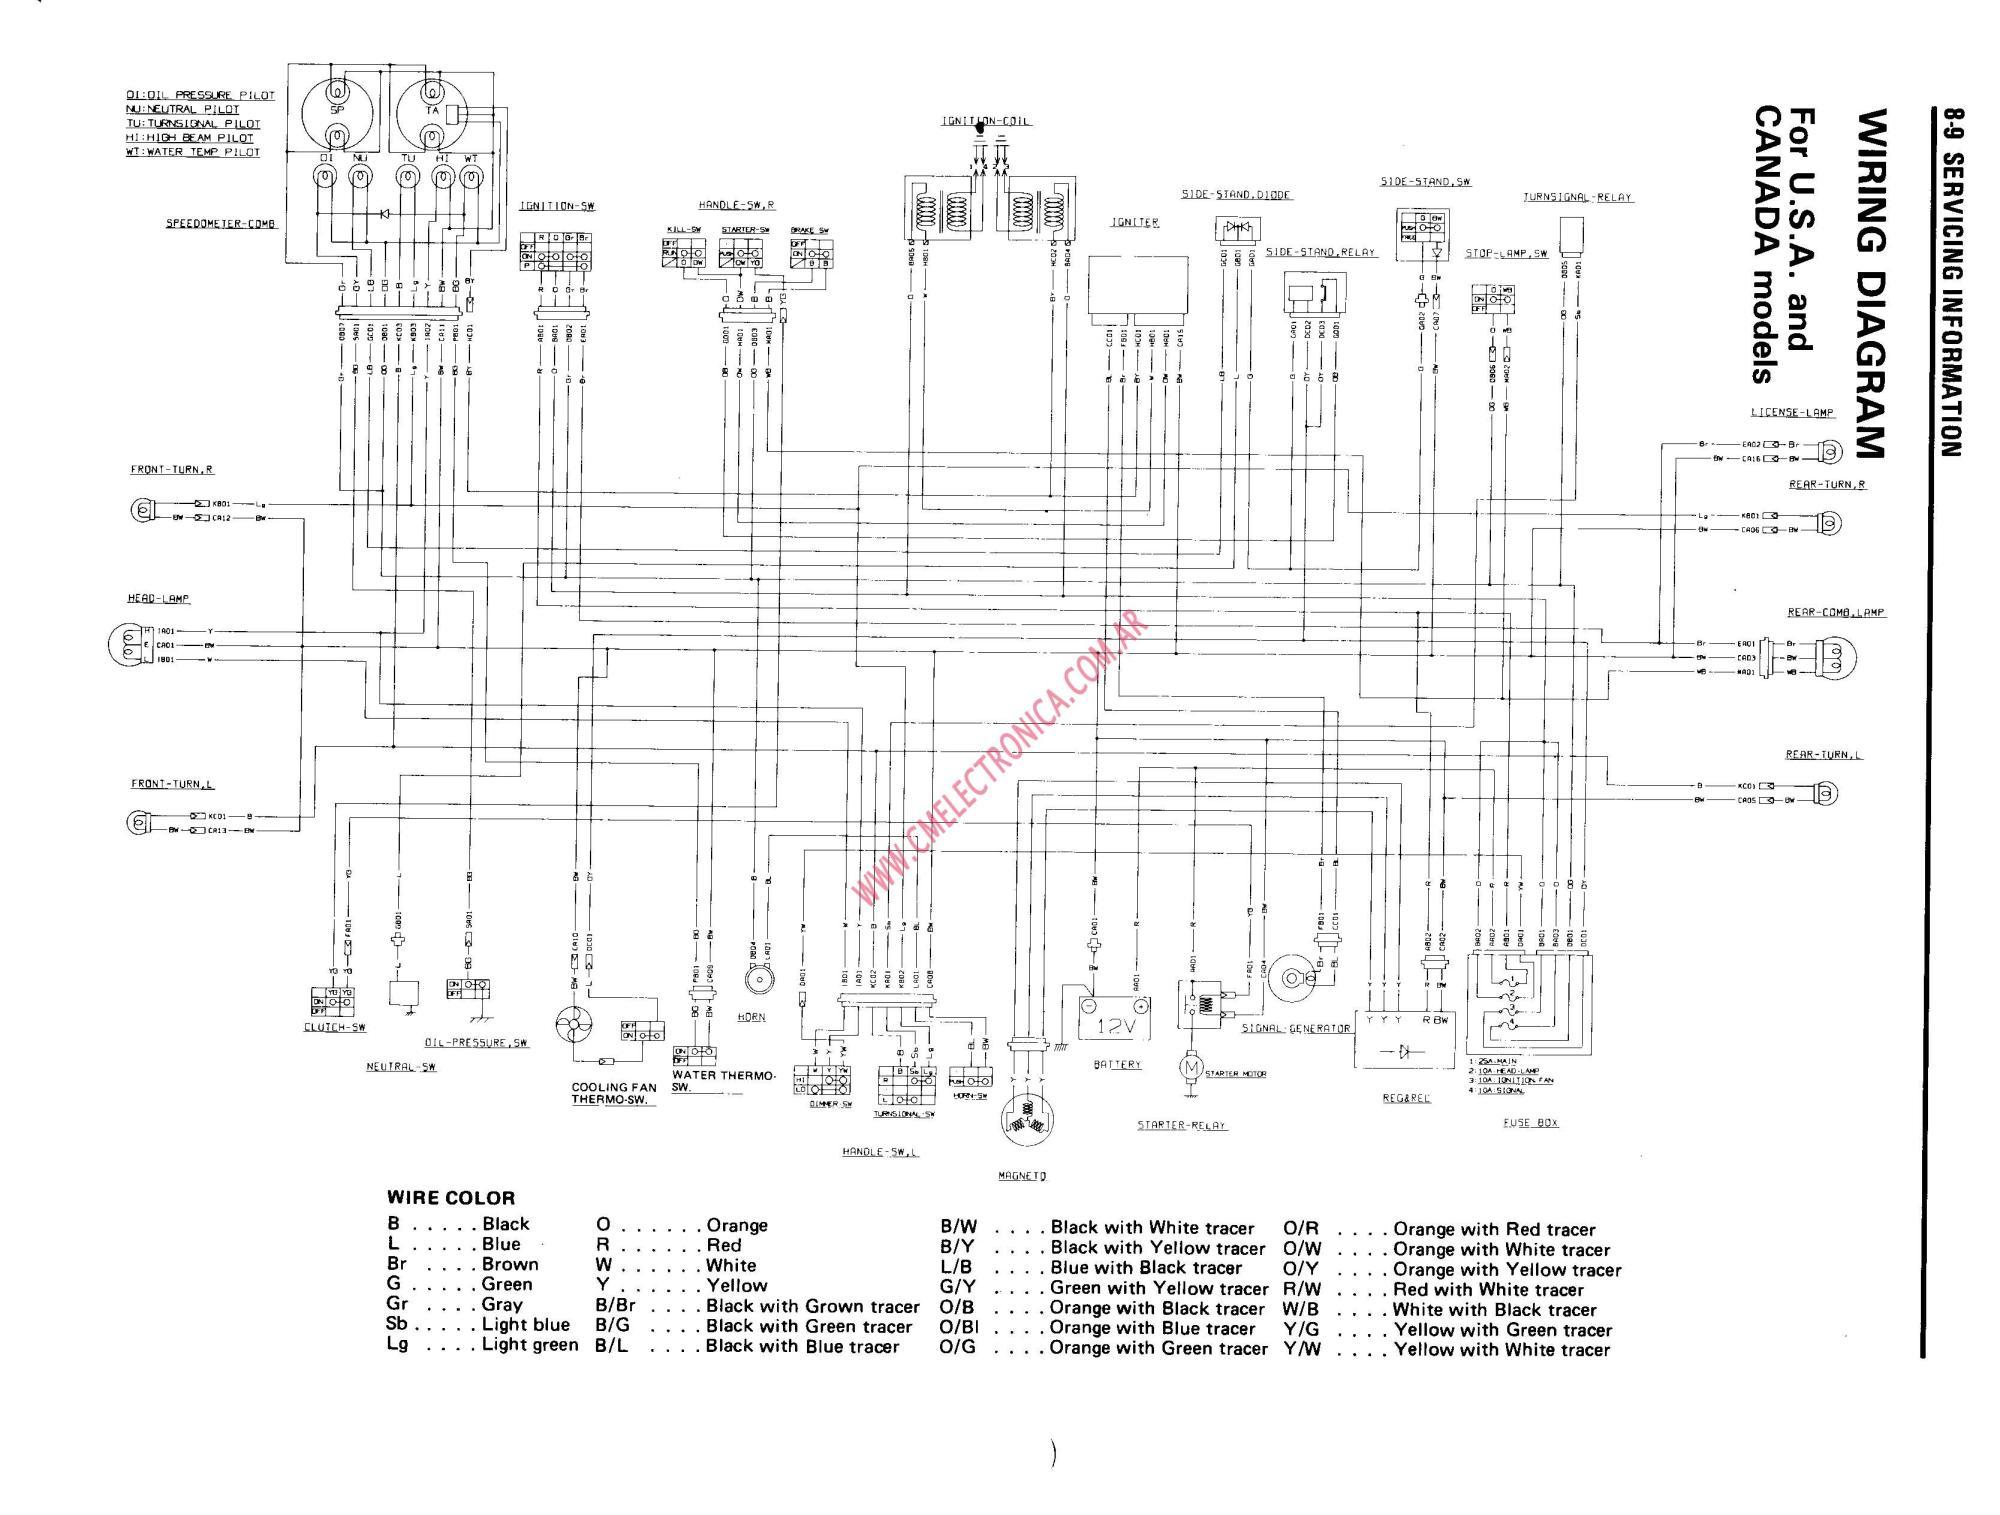 hight resolution of fz600 wiring diagram schematic diagramfz600 wiring diagram wiring diagram electronic circuit diagrams yamaha fz 600 wiring